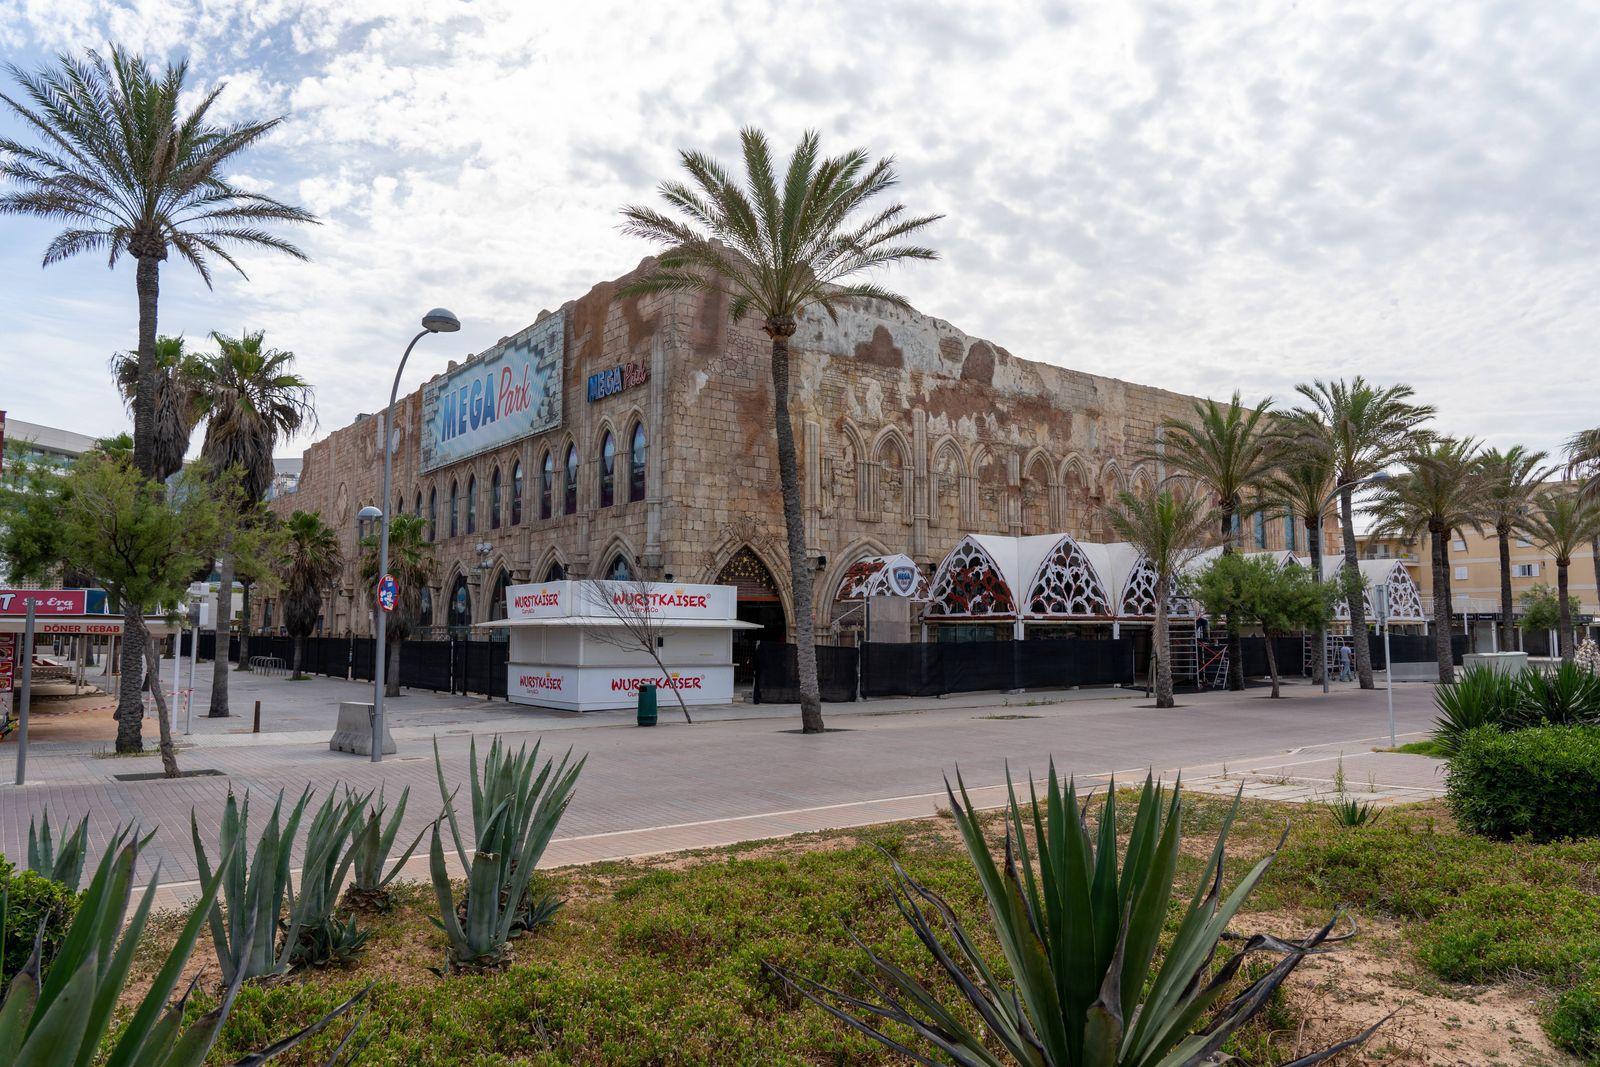 Nach dem Corona-Shutdown - Vor dem Neustart des Tourismus auf Mallorca Spanien Szenen aus Playa de Palma - Mega Park co